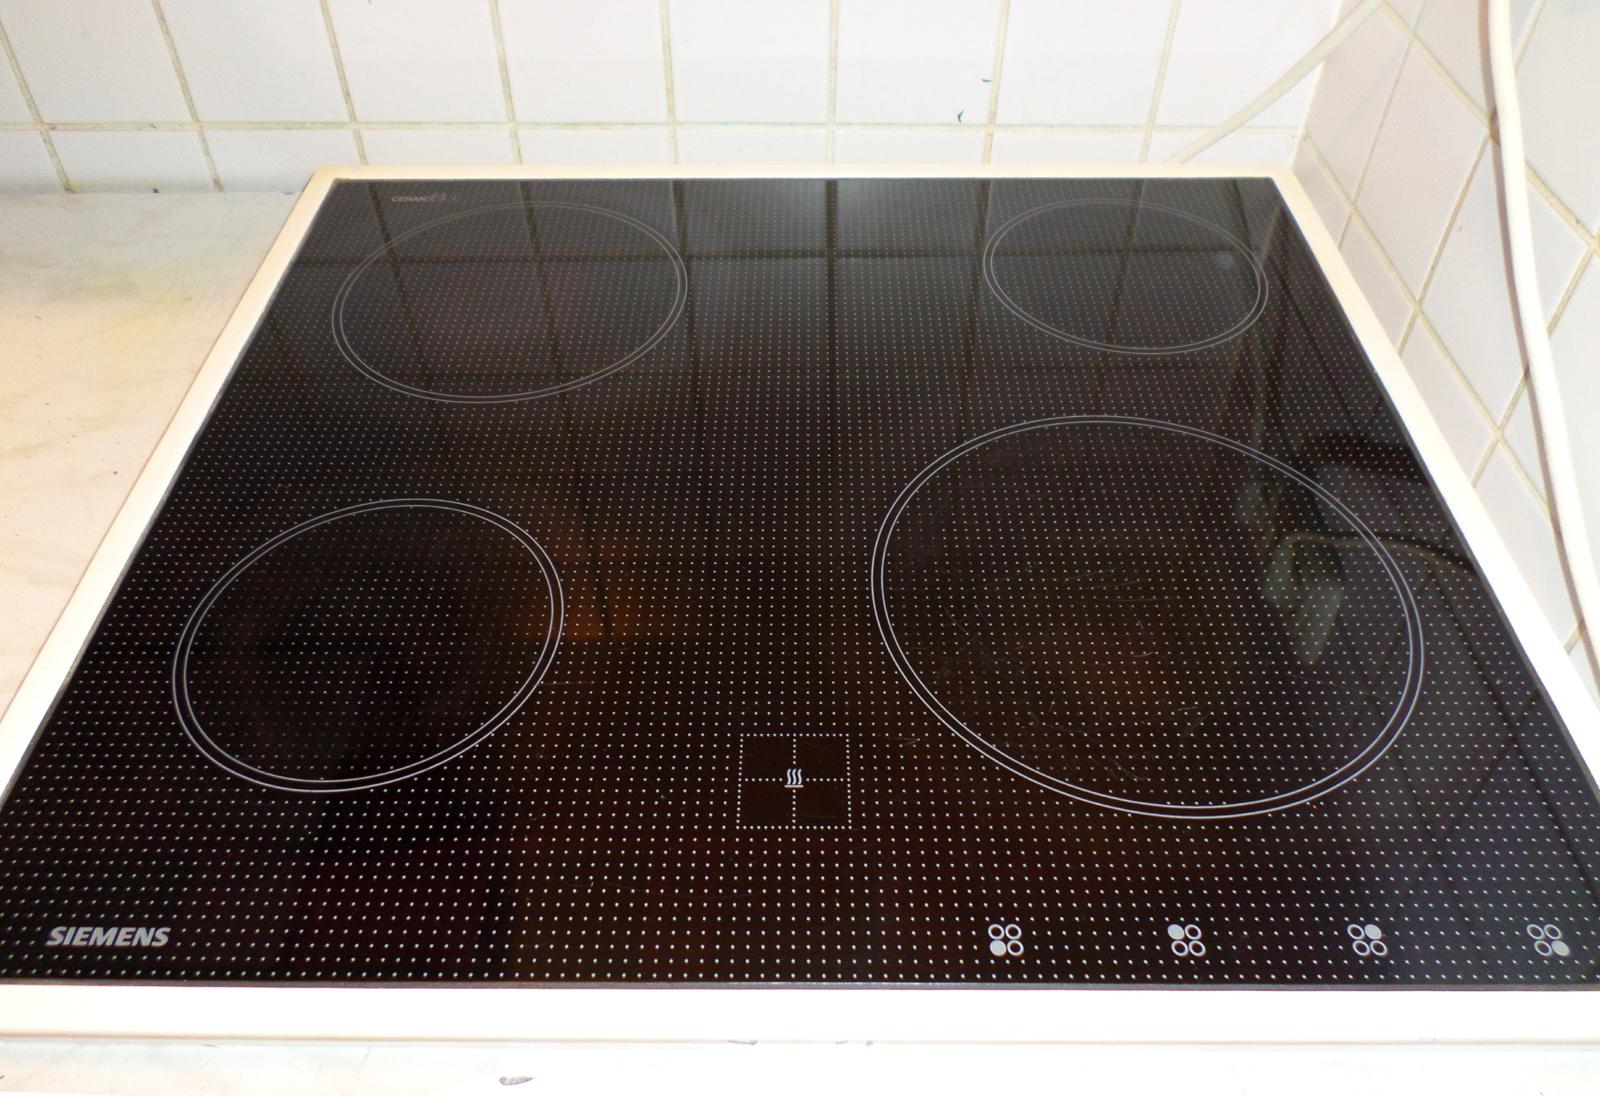 siemens ekt710 s schott ceran glaskeramik ersatzglas. Black Bedroom Furniture Sets. Home Design Ideas